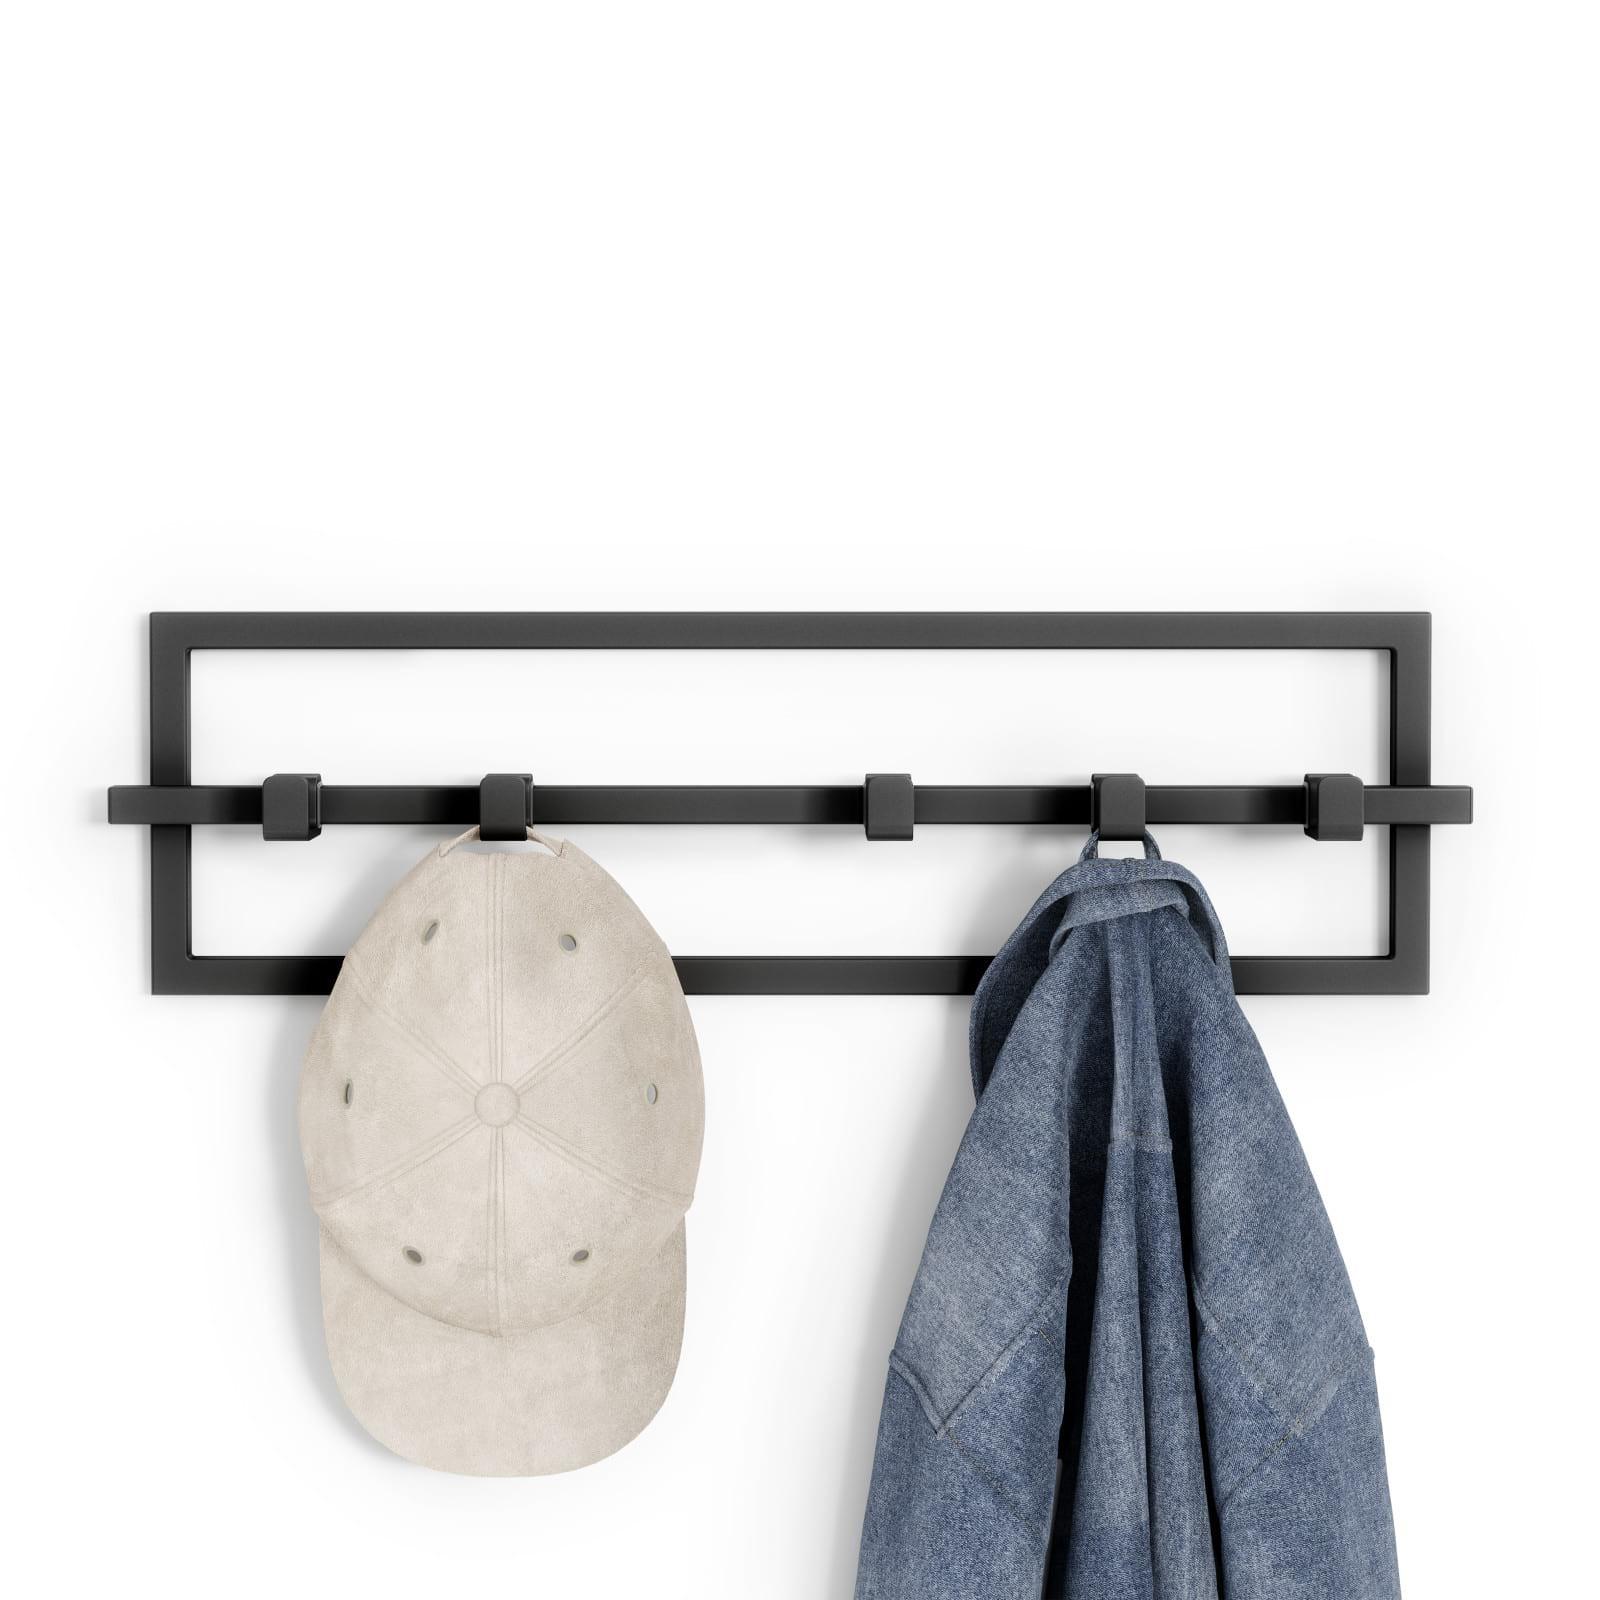 Cubiko 5 Hook Coat Rack (Black) - Umbra